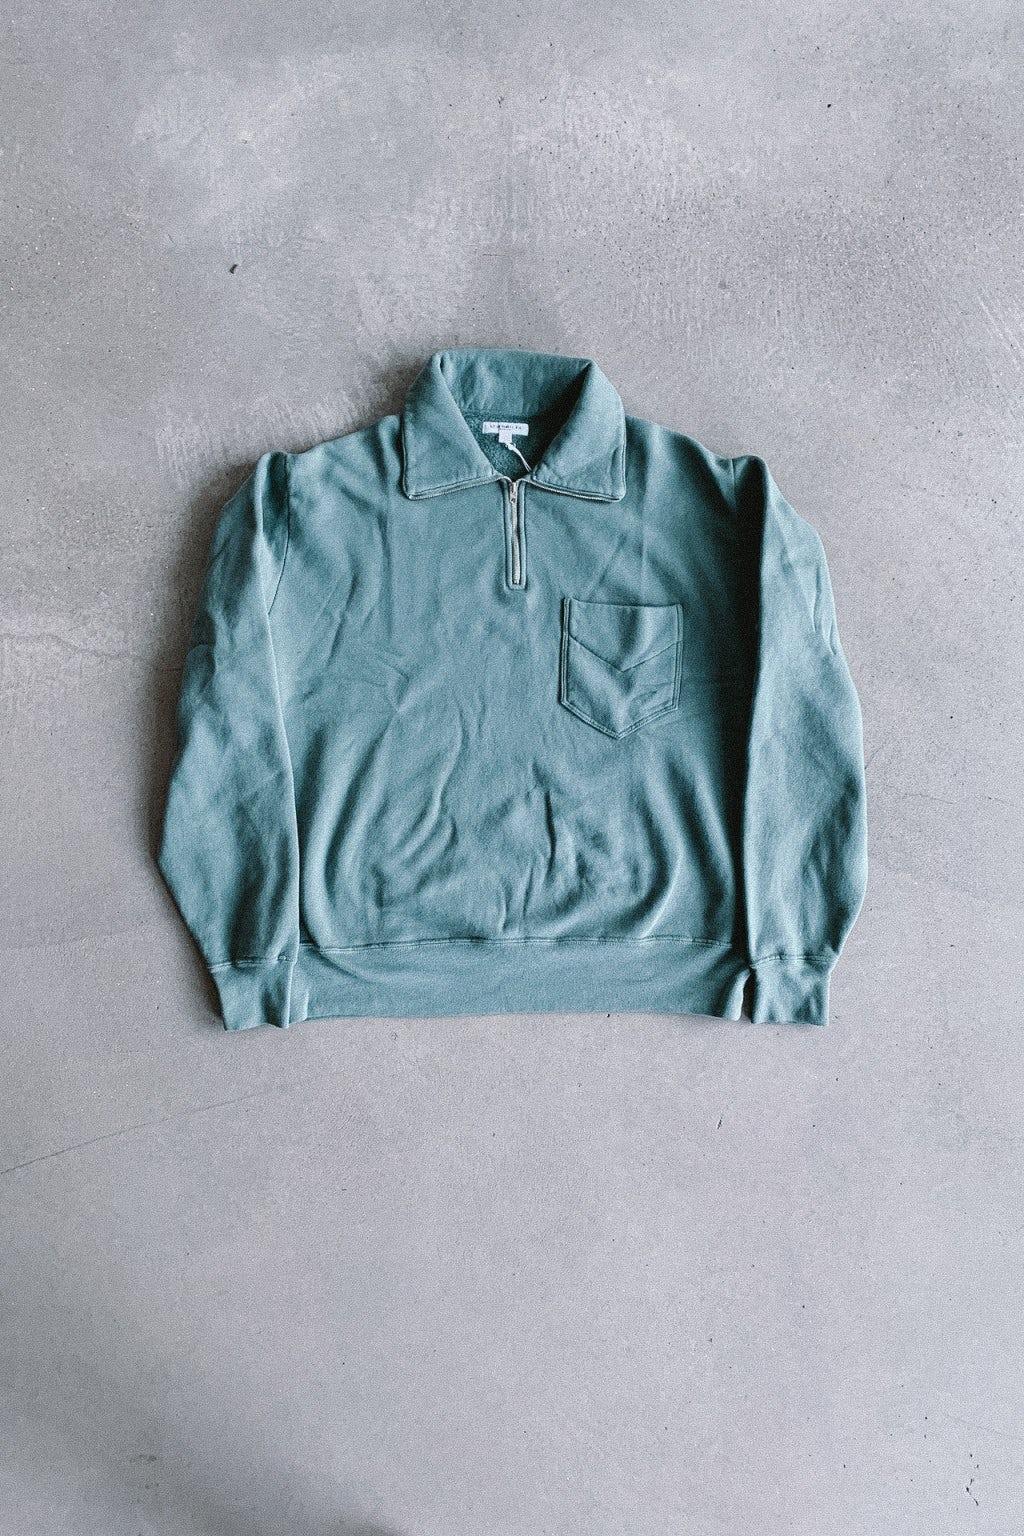 Lady White Co. Quarter Zip Sweatshirt EZ Sage